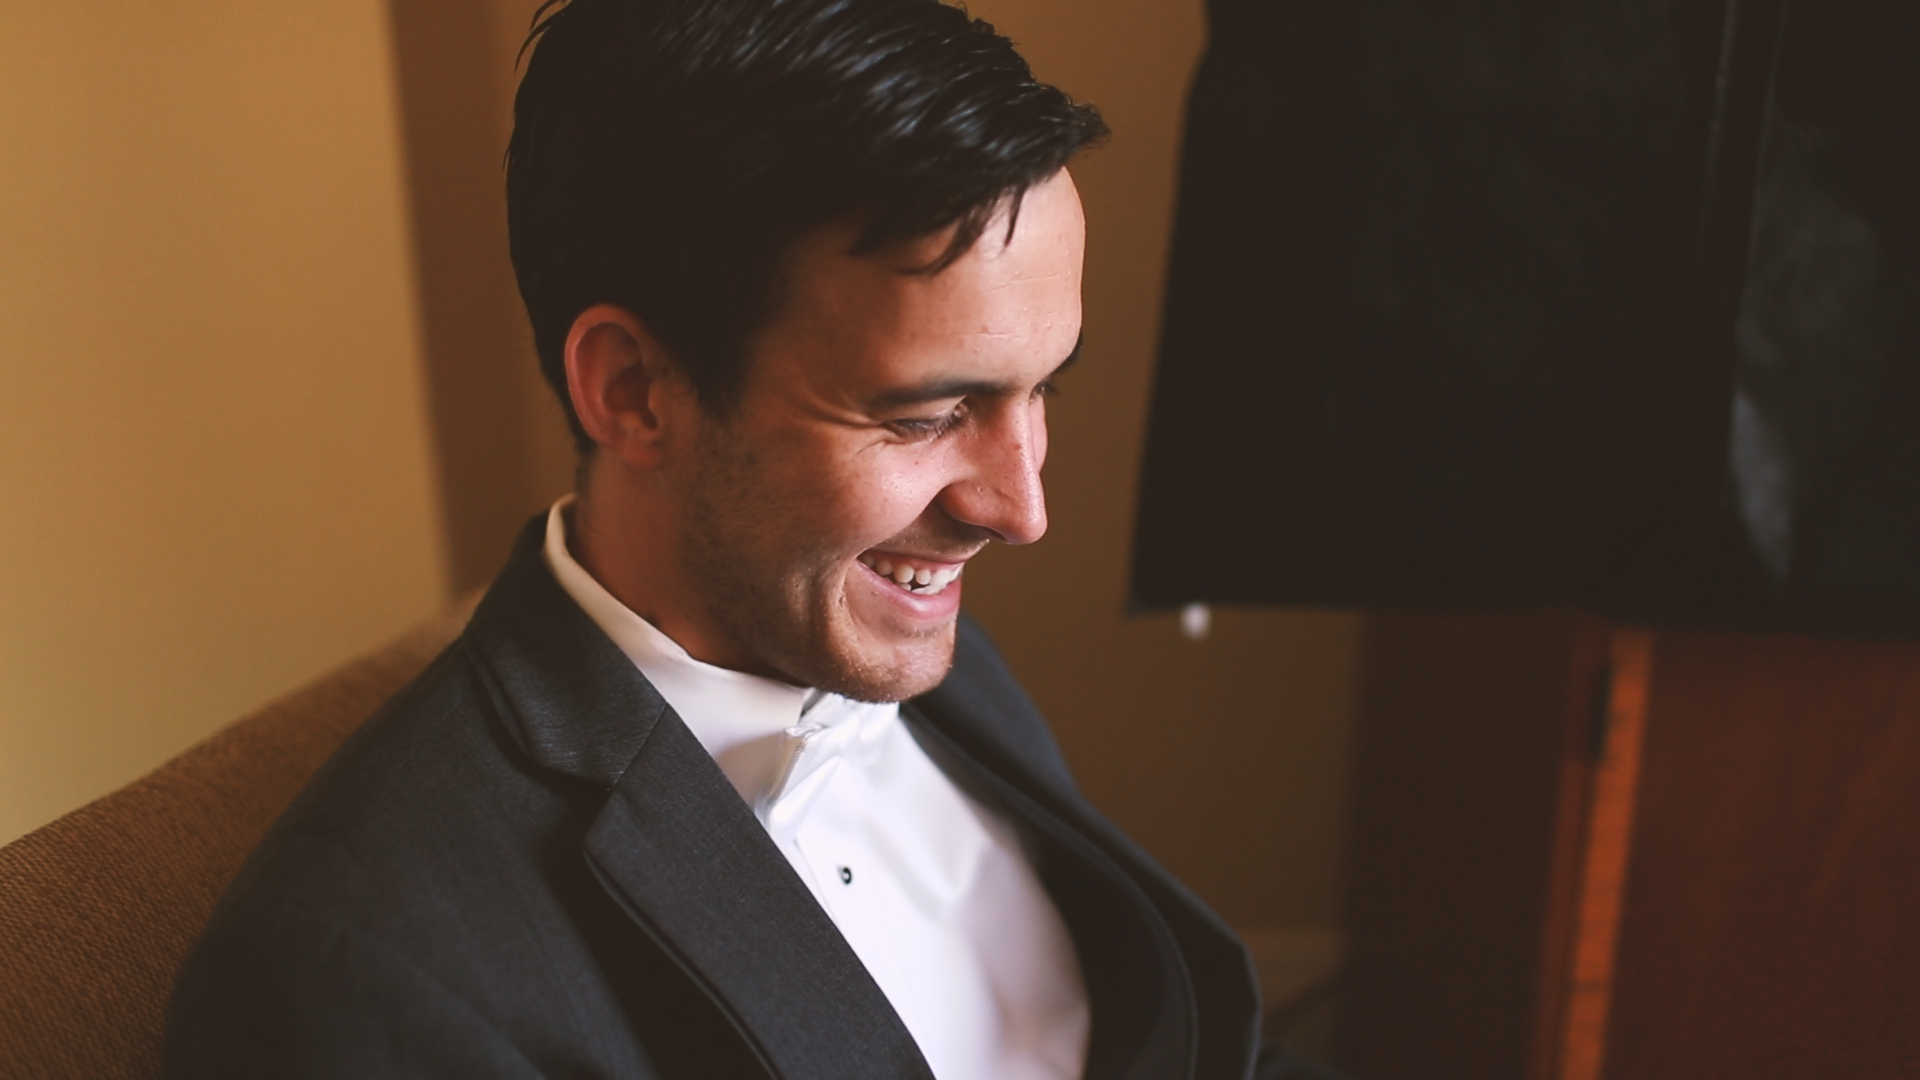 Wedding Gifts - Bride Film